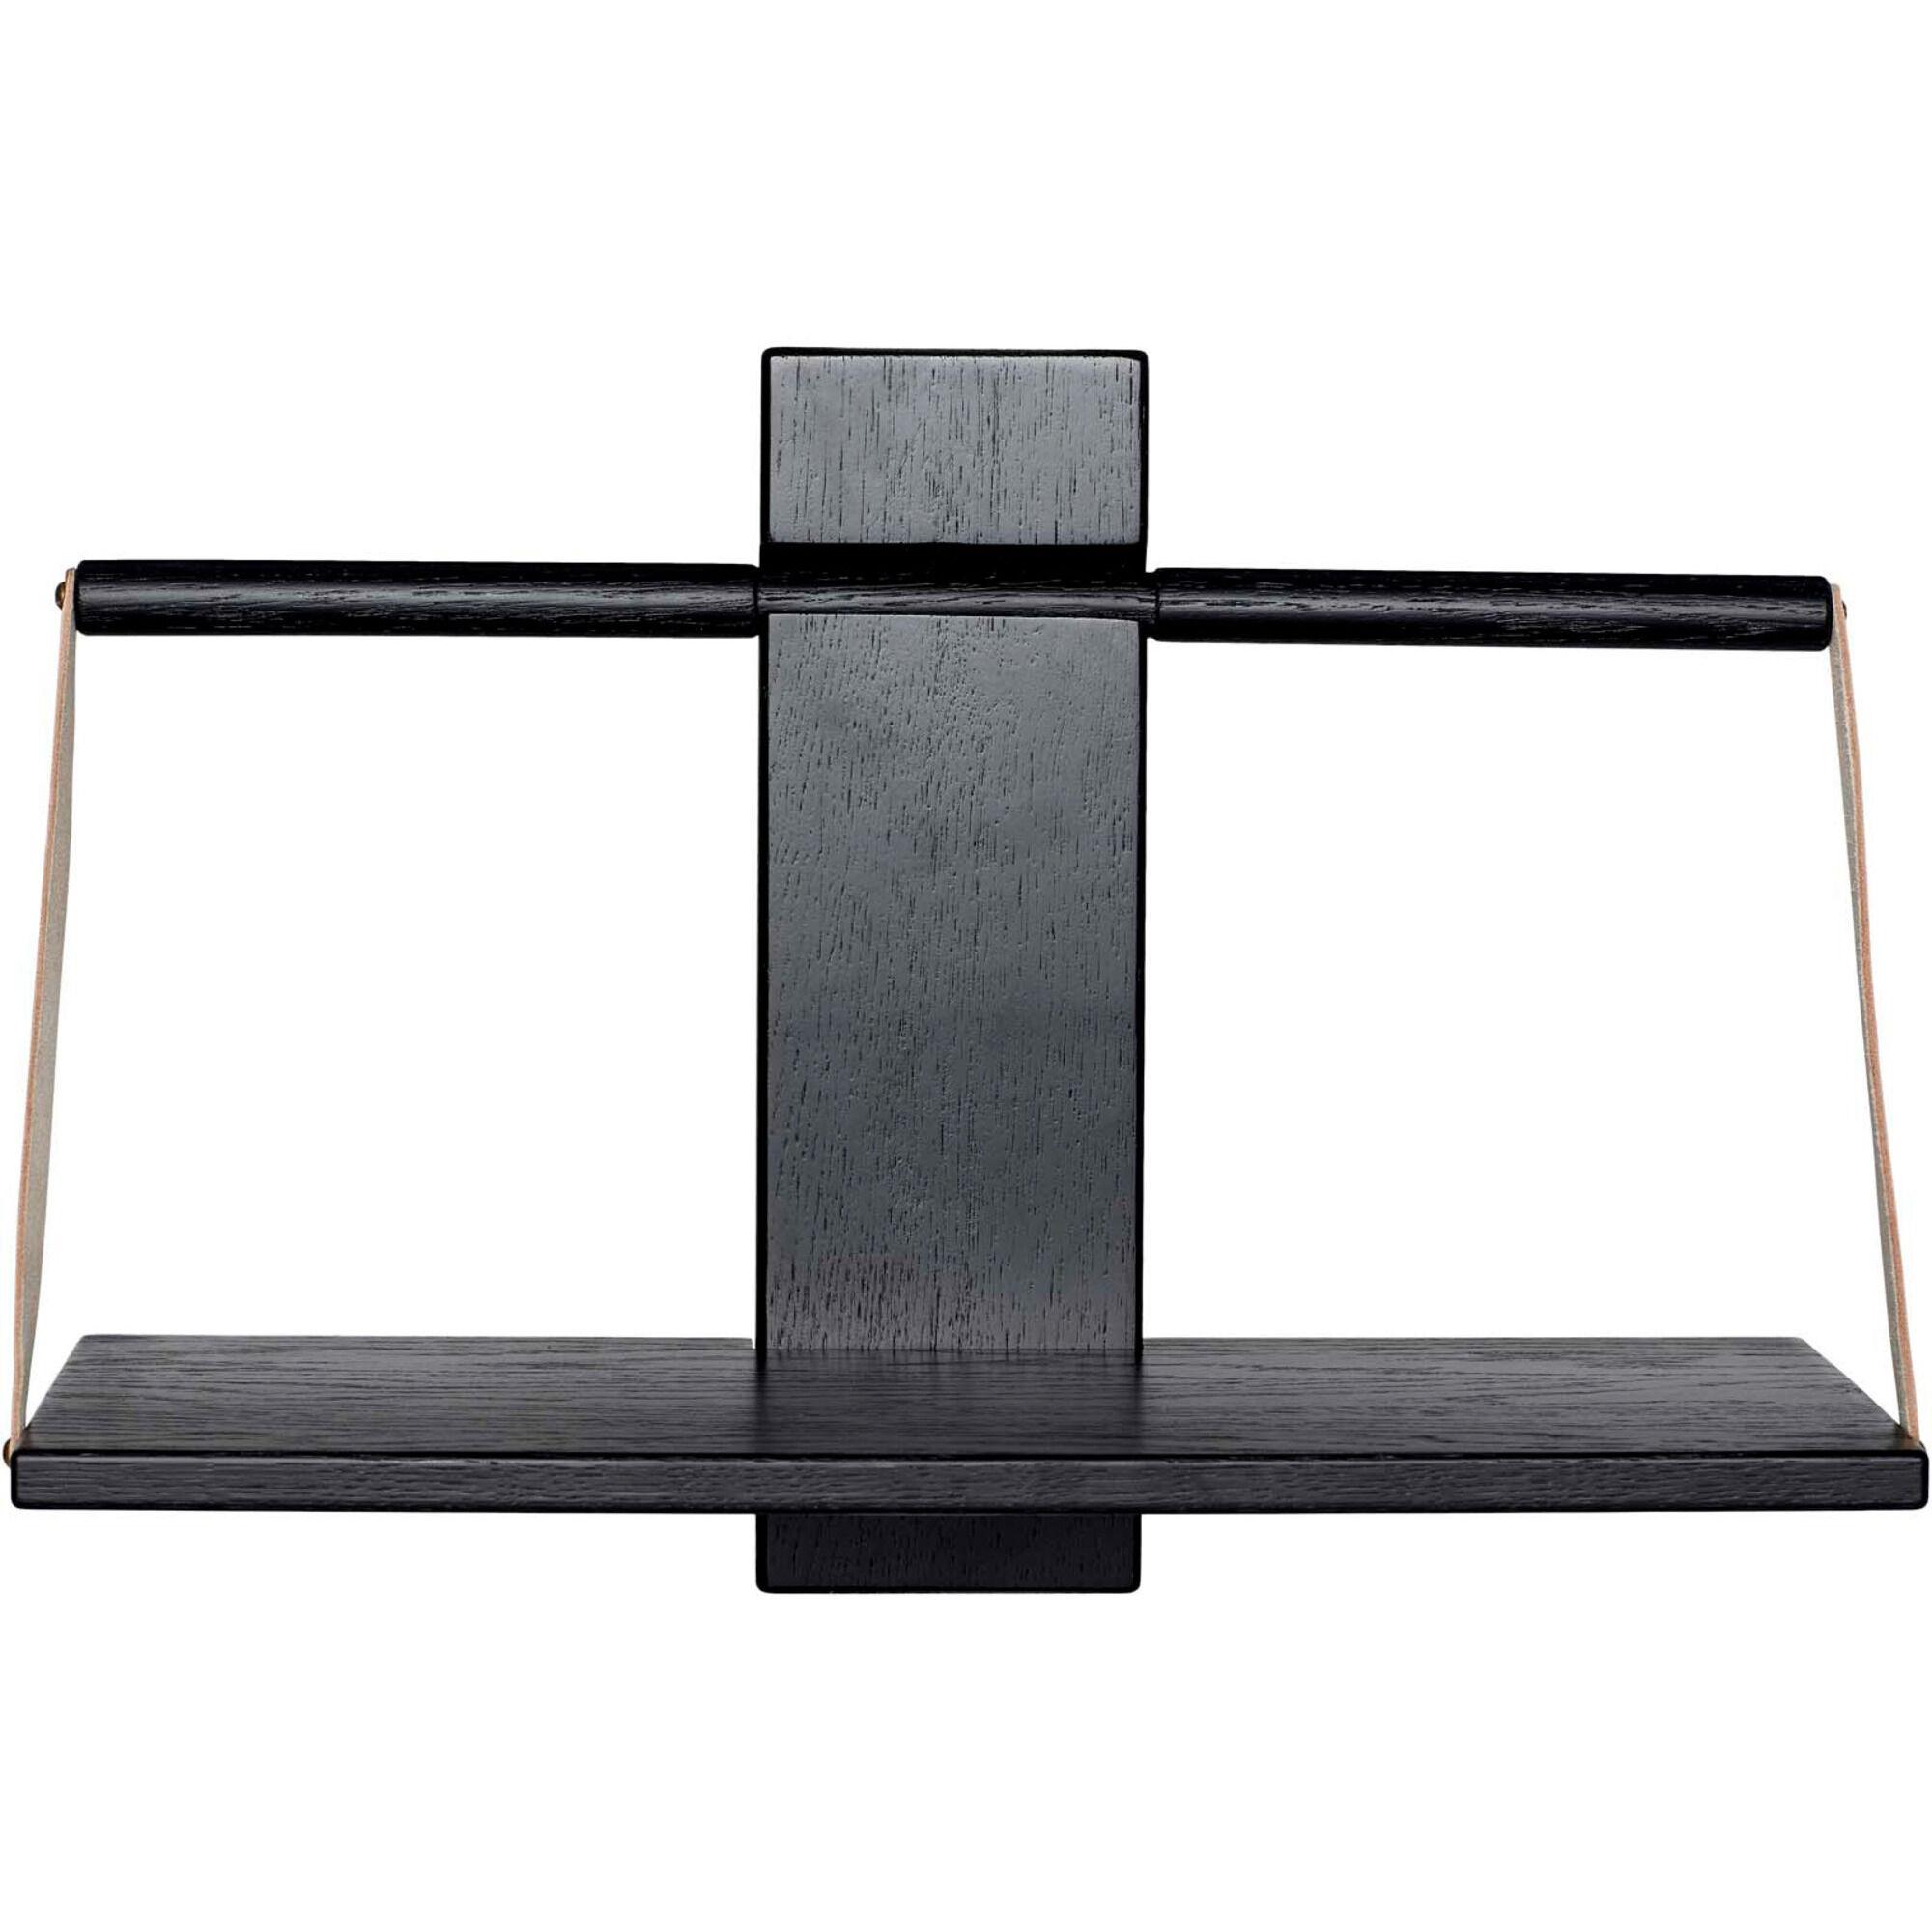 Andersen Furniture Wood wall Shelf 45 x 20 x 32 cm Medium Black